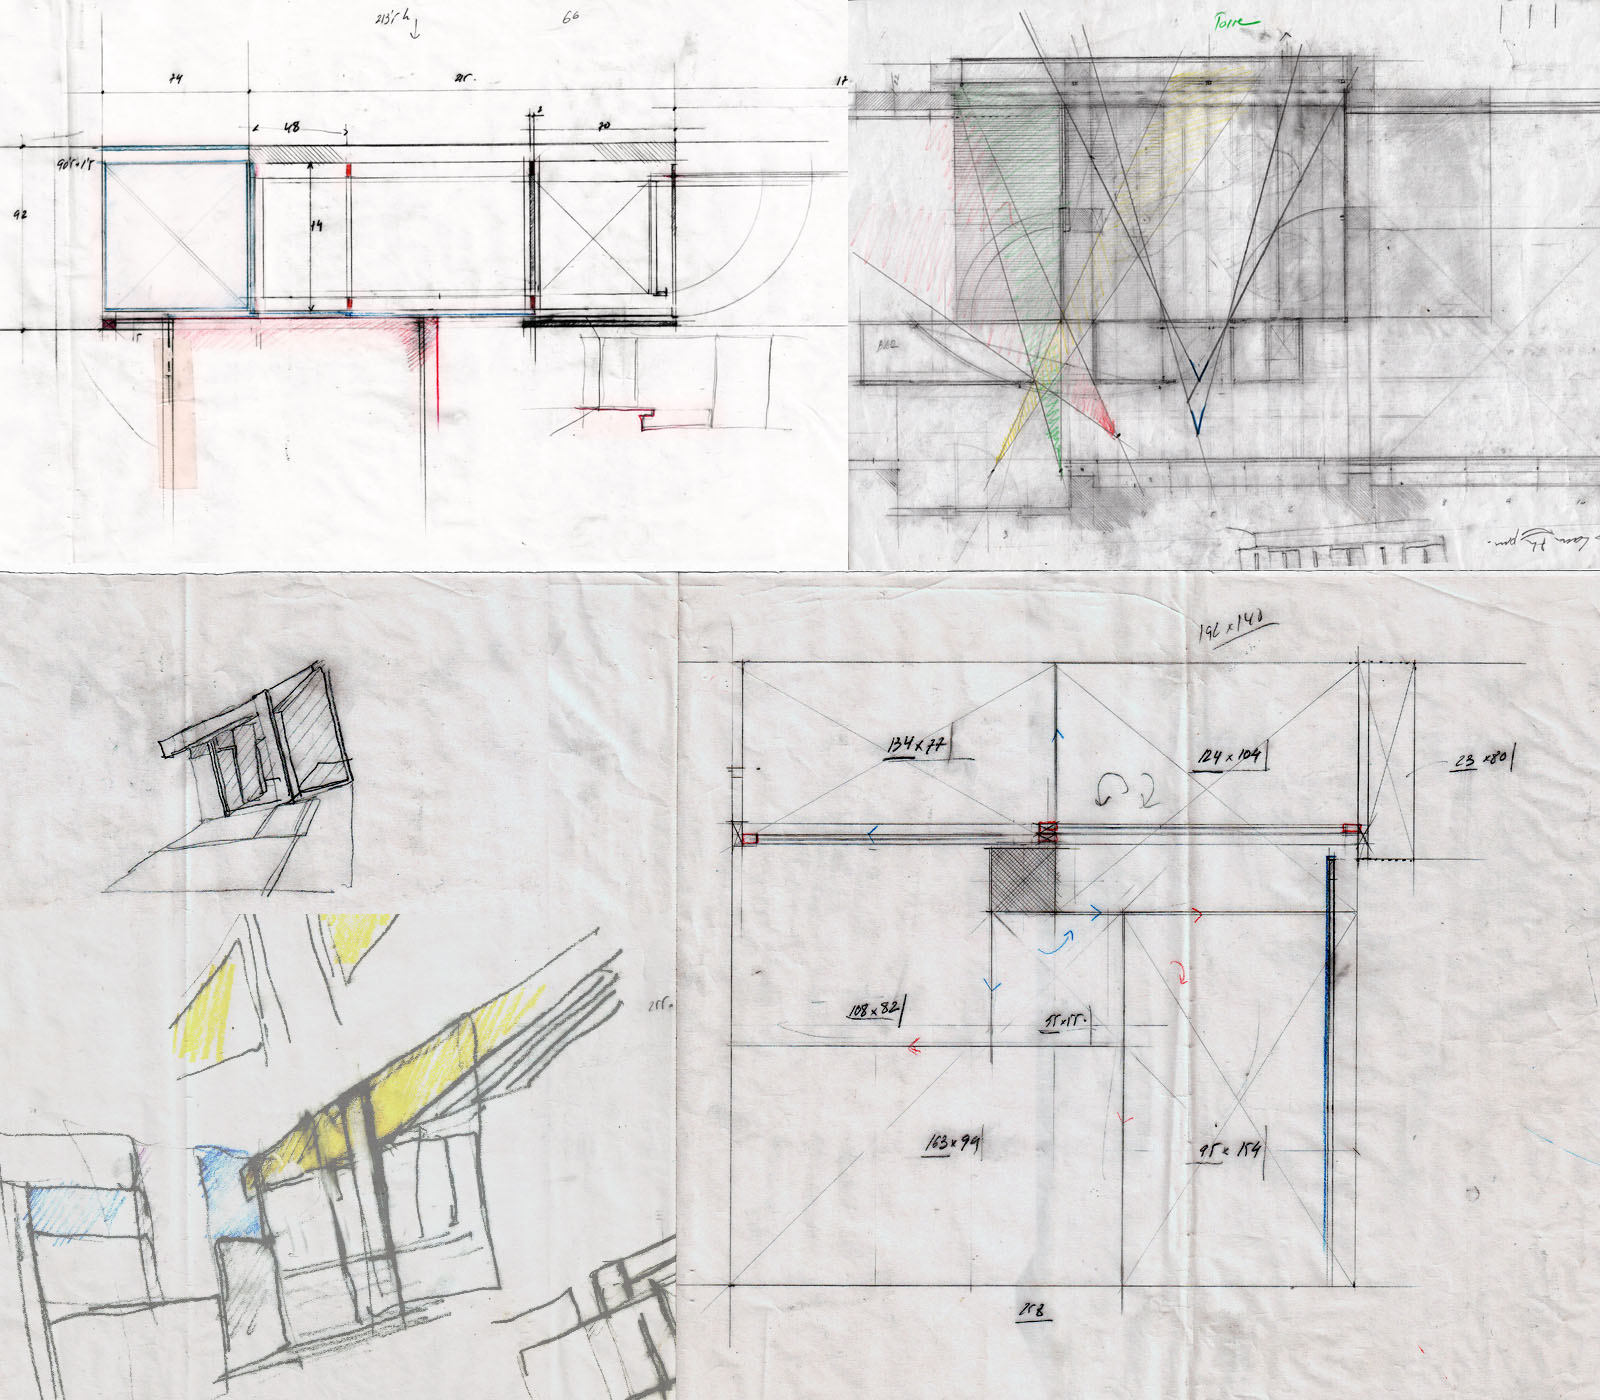 danielvillalobos-architecturexxithcentury-spanisharchitecture-3.3